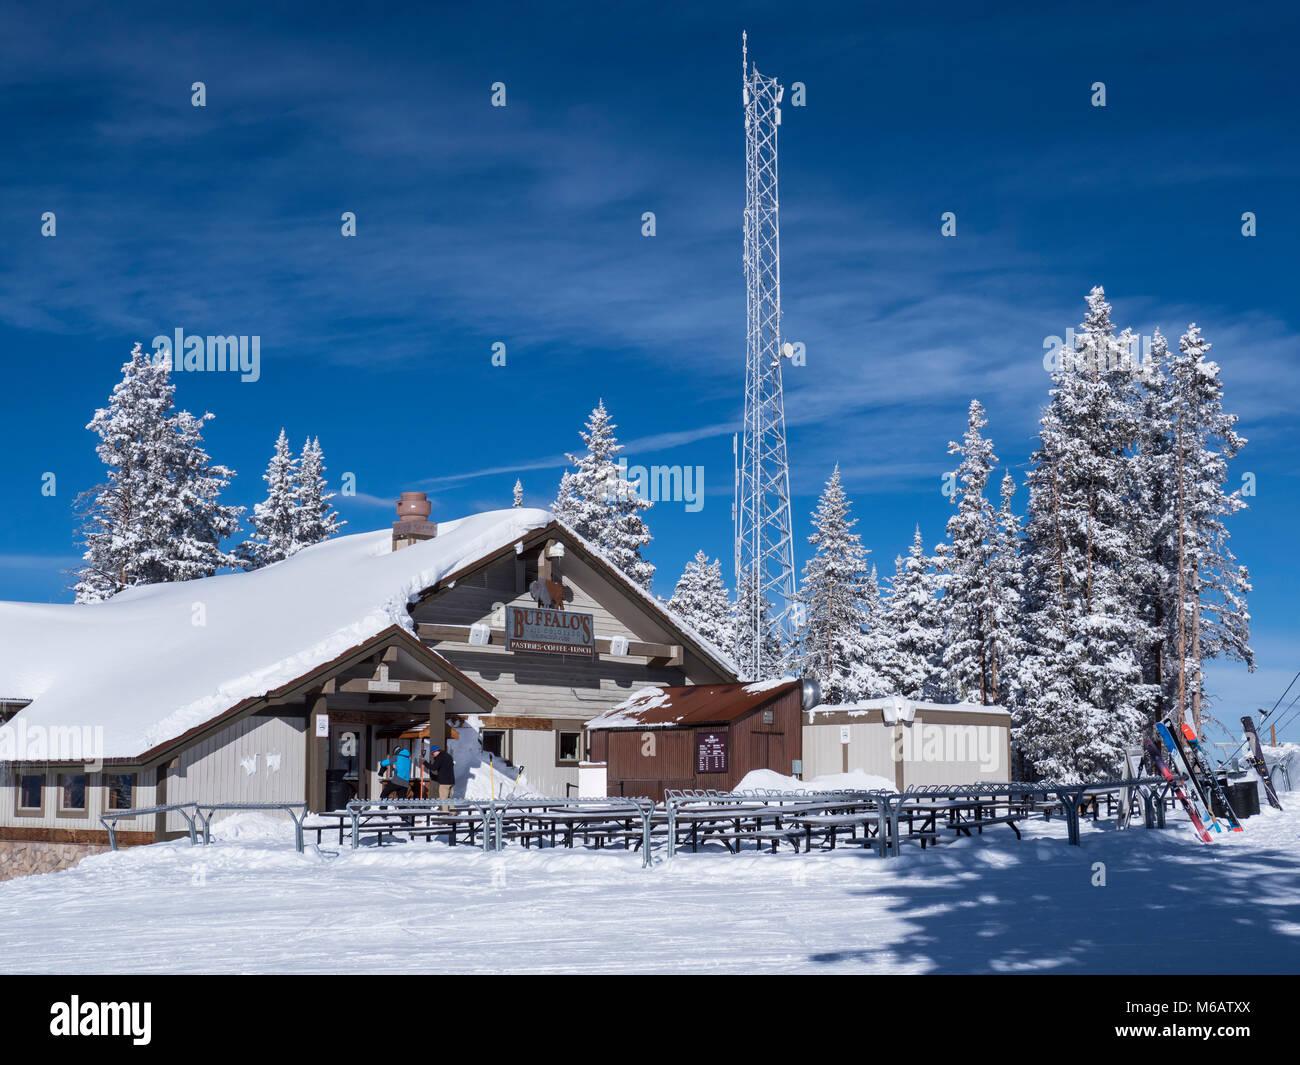 Buffalo's day lodge and restaurant, winter, Vail Ski Resort, Vail, Colorado. - Stock Image